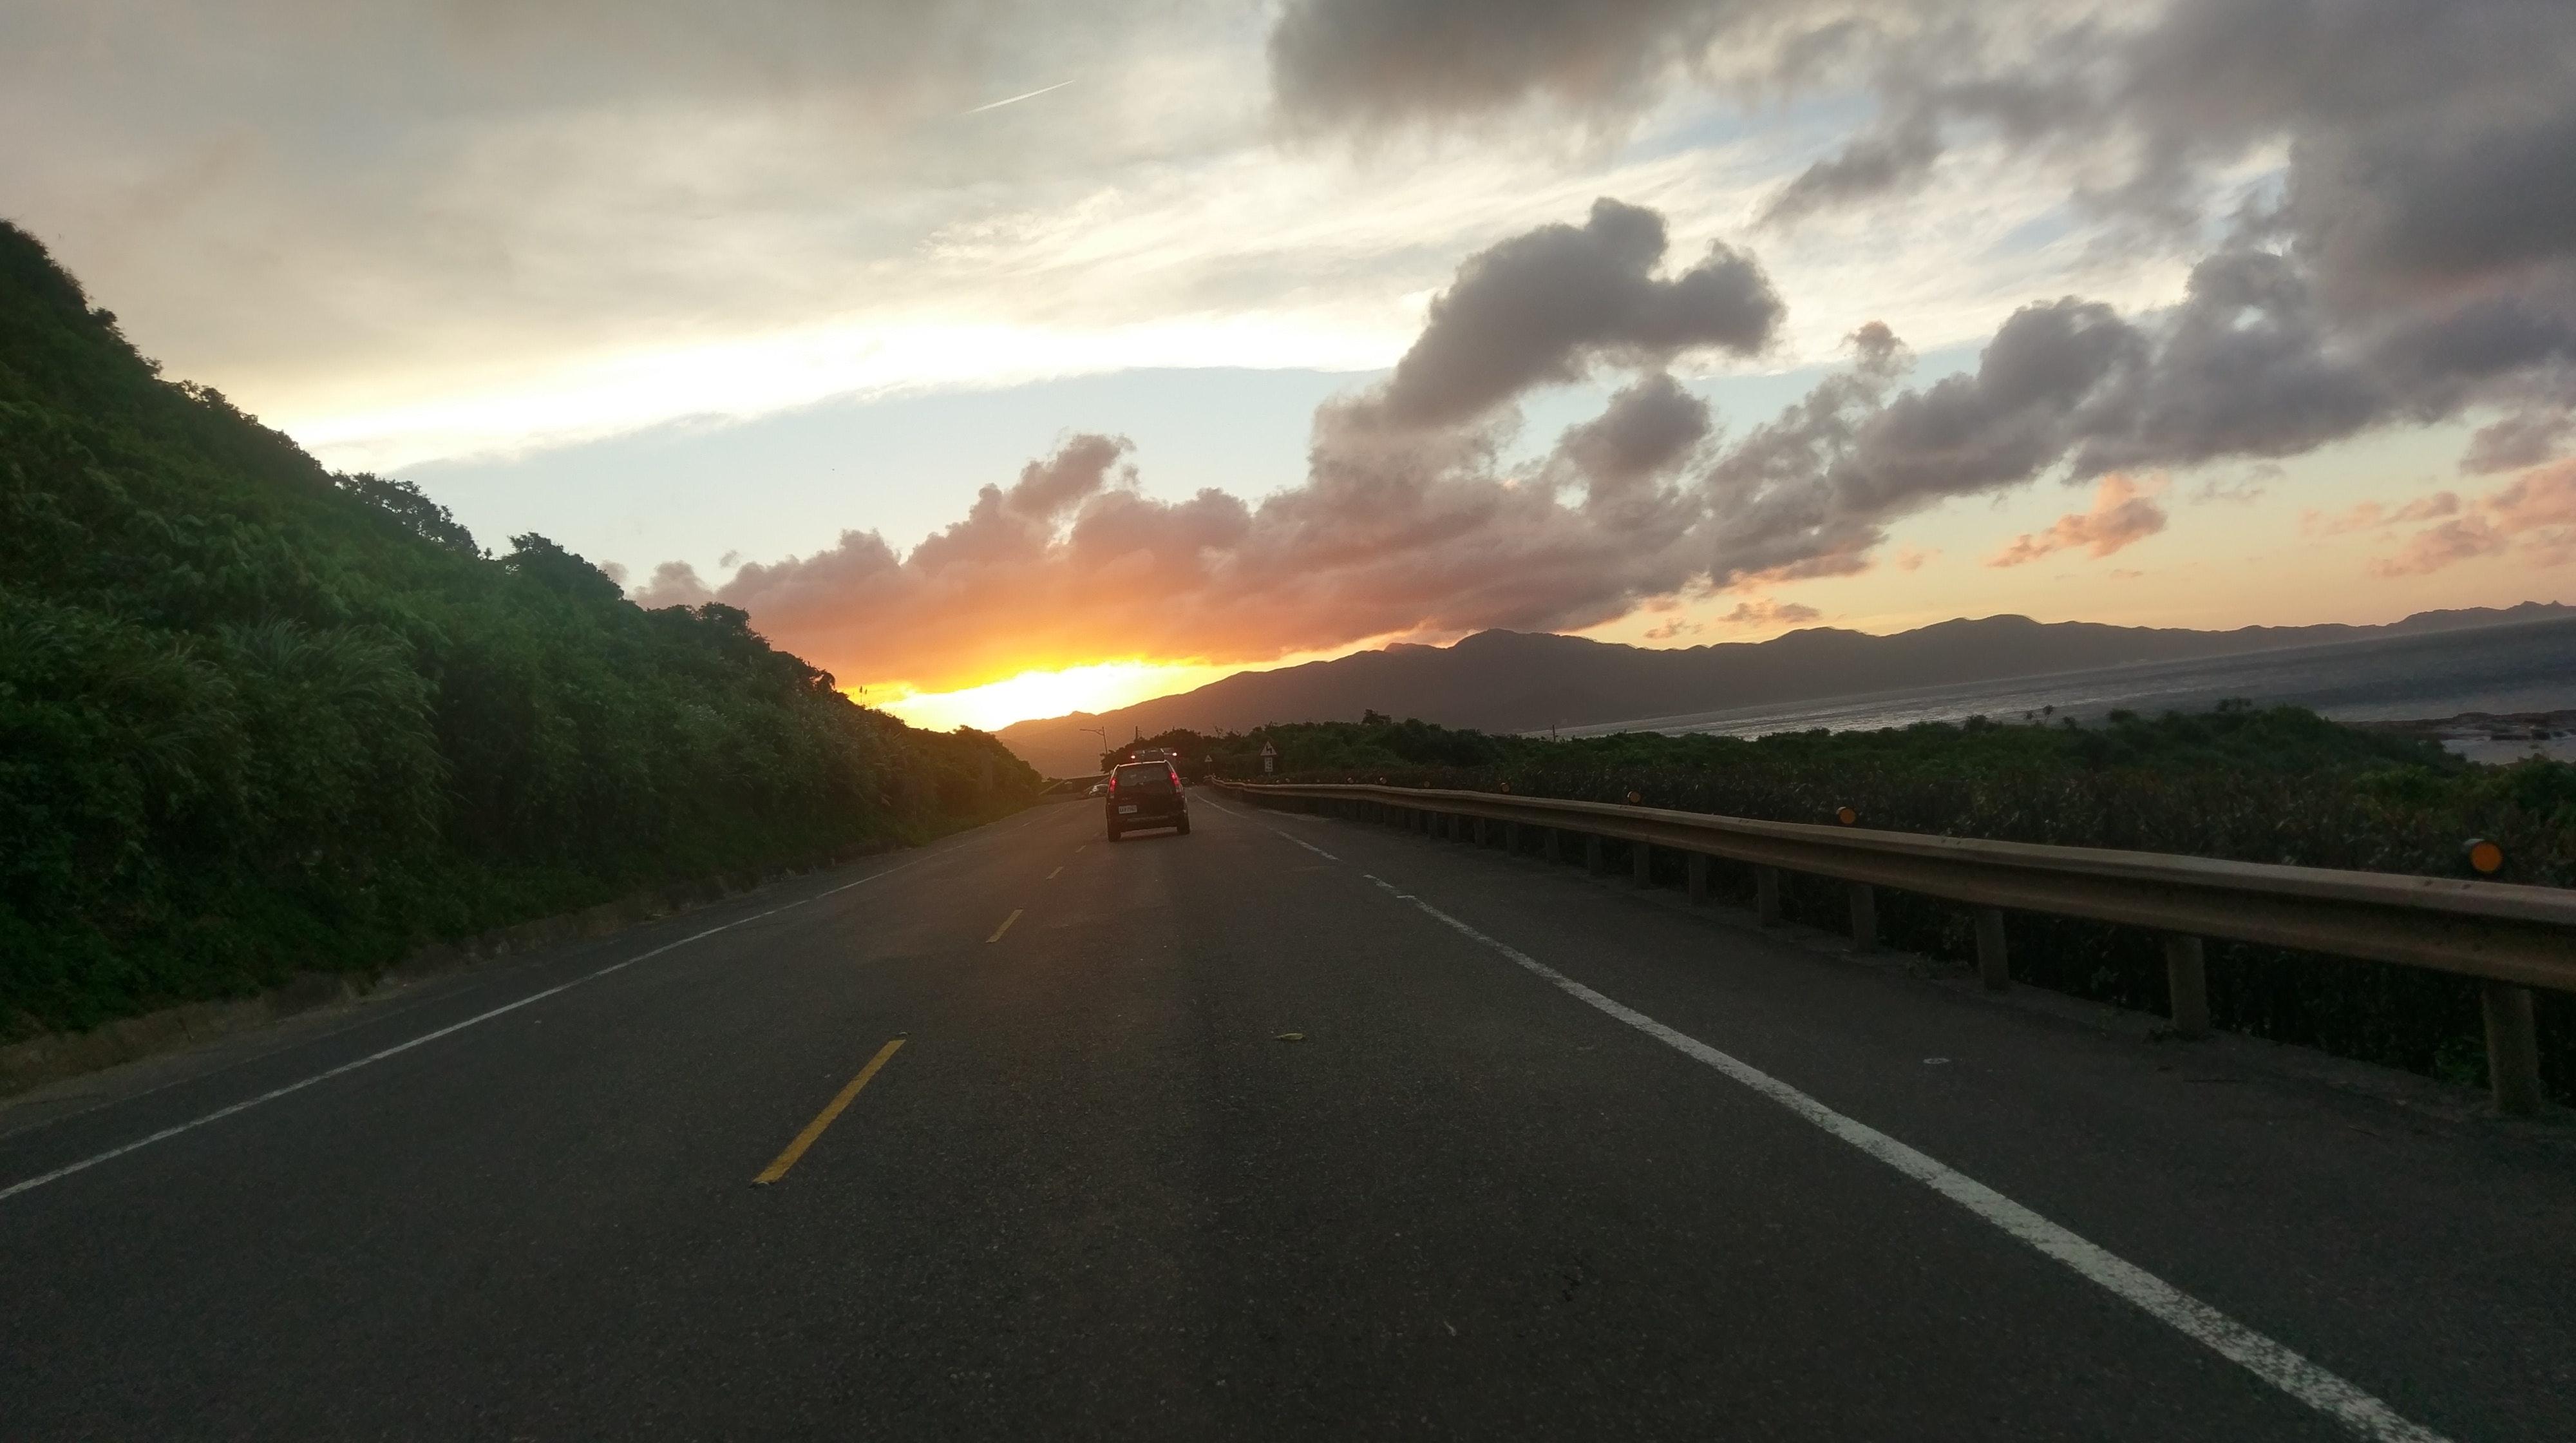 Free stock photo of golden sunset, road trip, Taipei